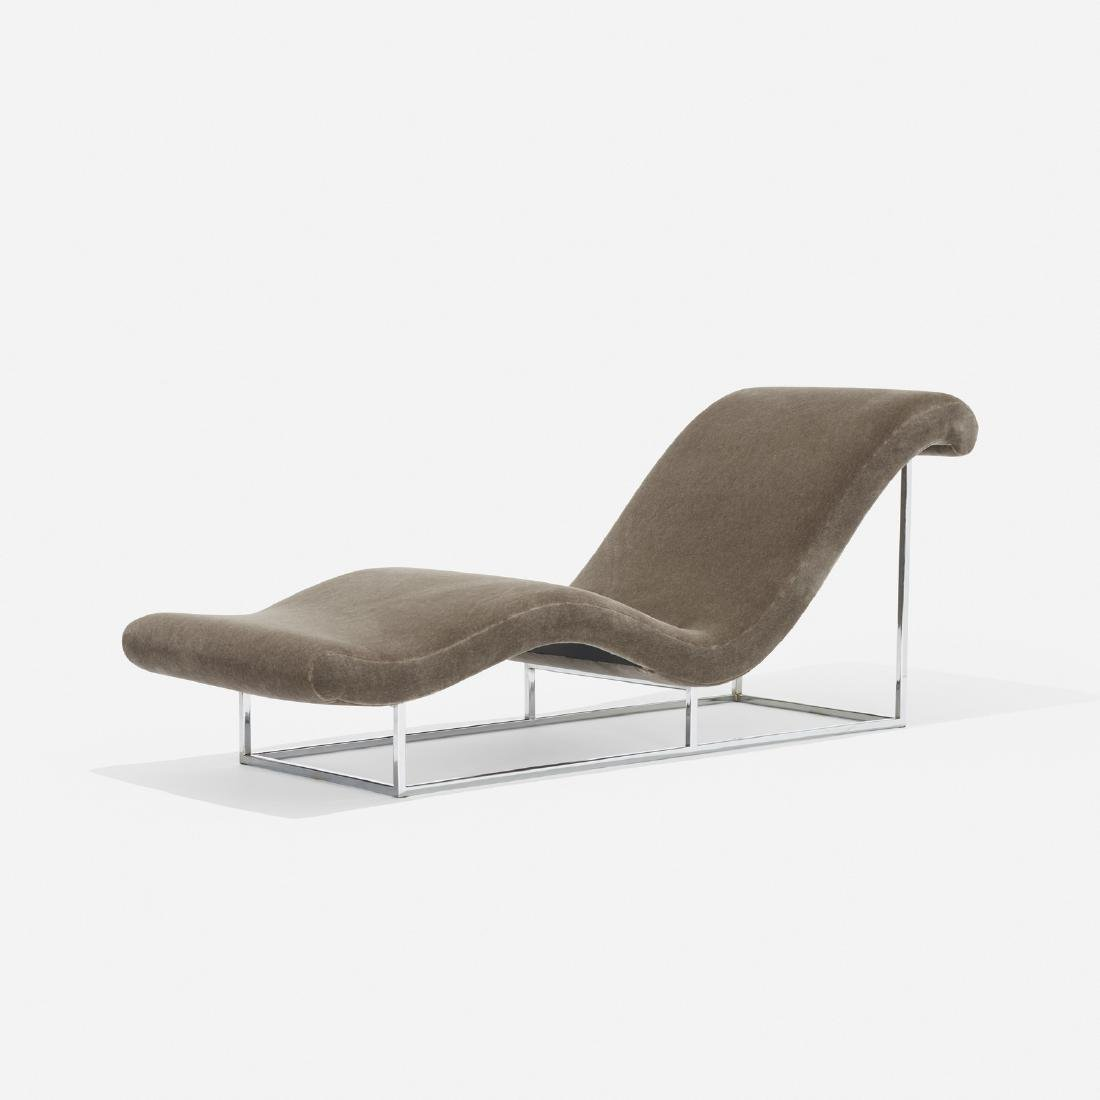 Milo Baughman, chaise lounge